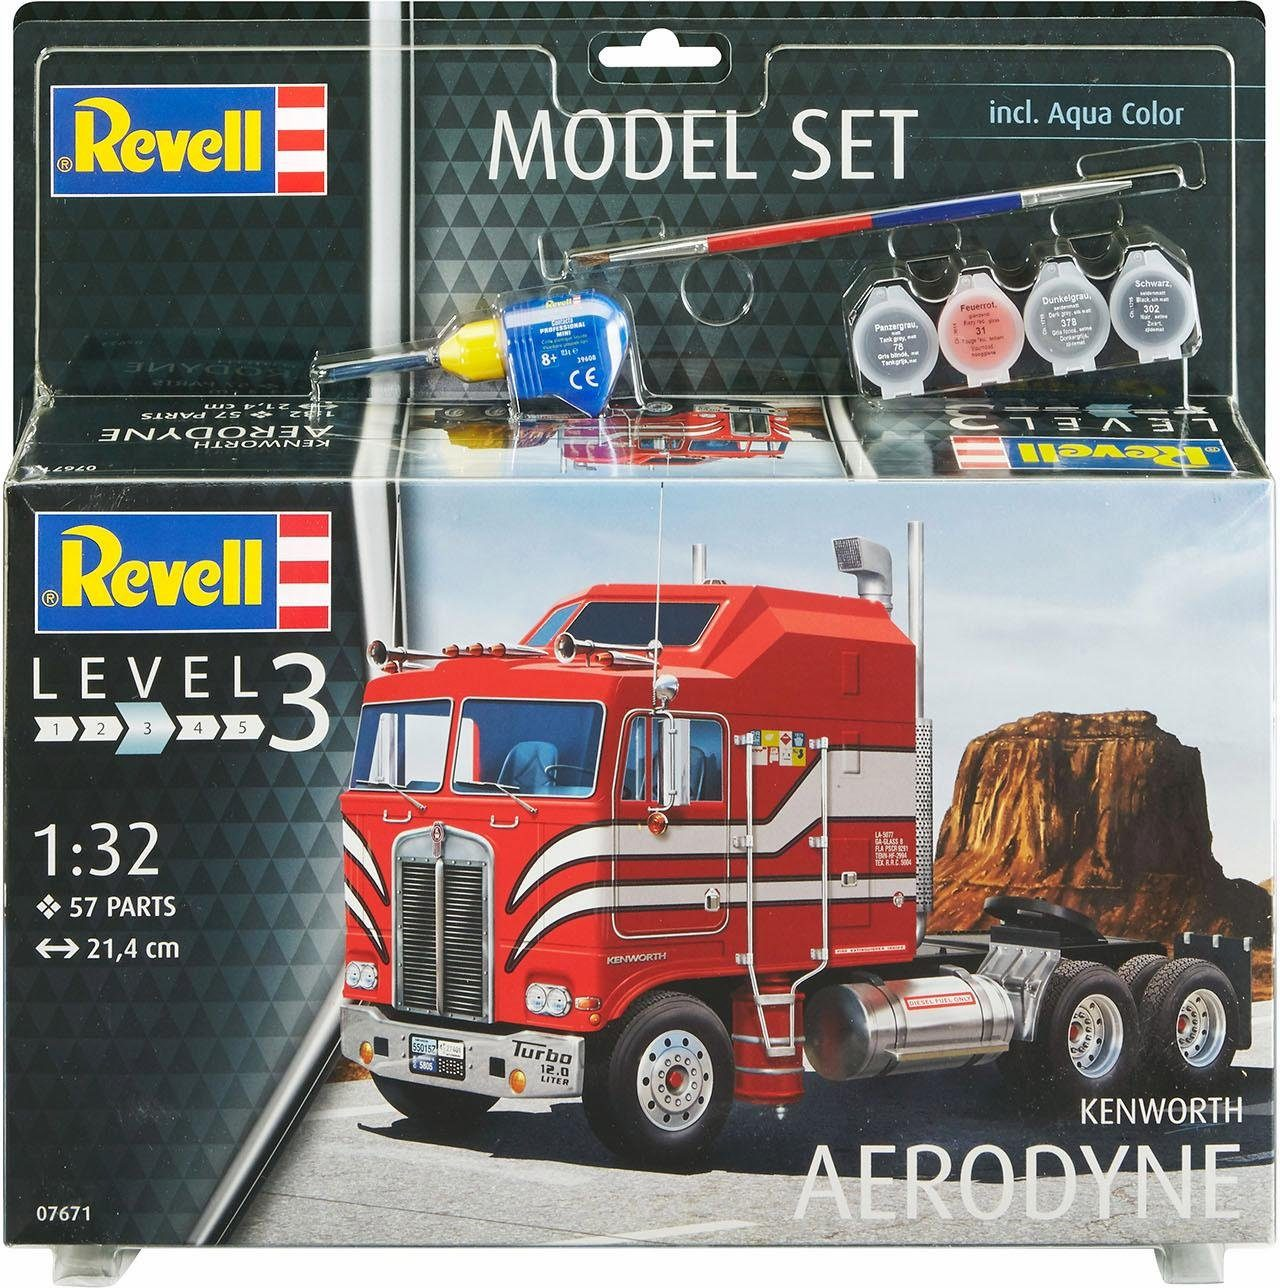 Revell Modellbausatz LKW mit Zubehör, »Model Set, Kenworth COE Aerodyne«